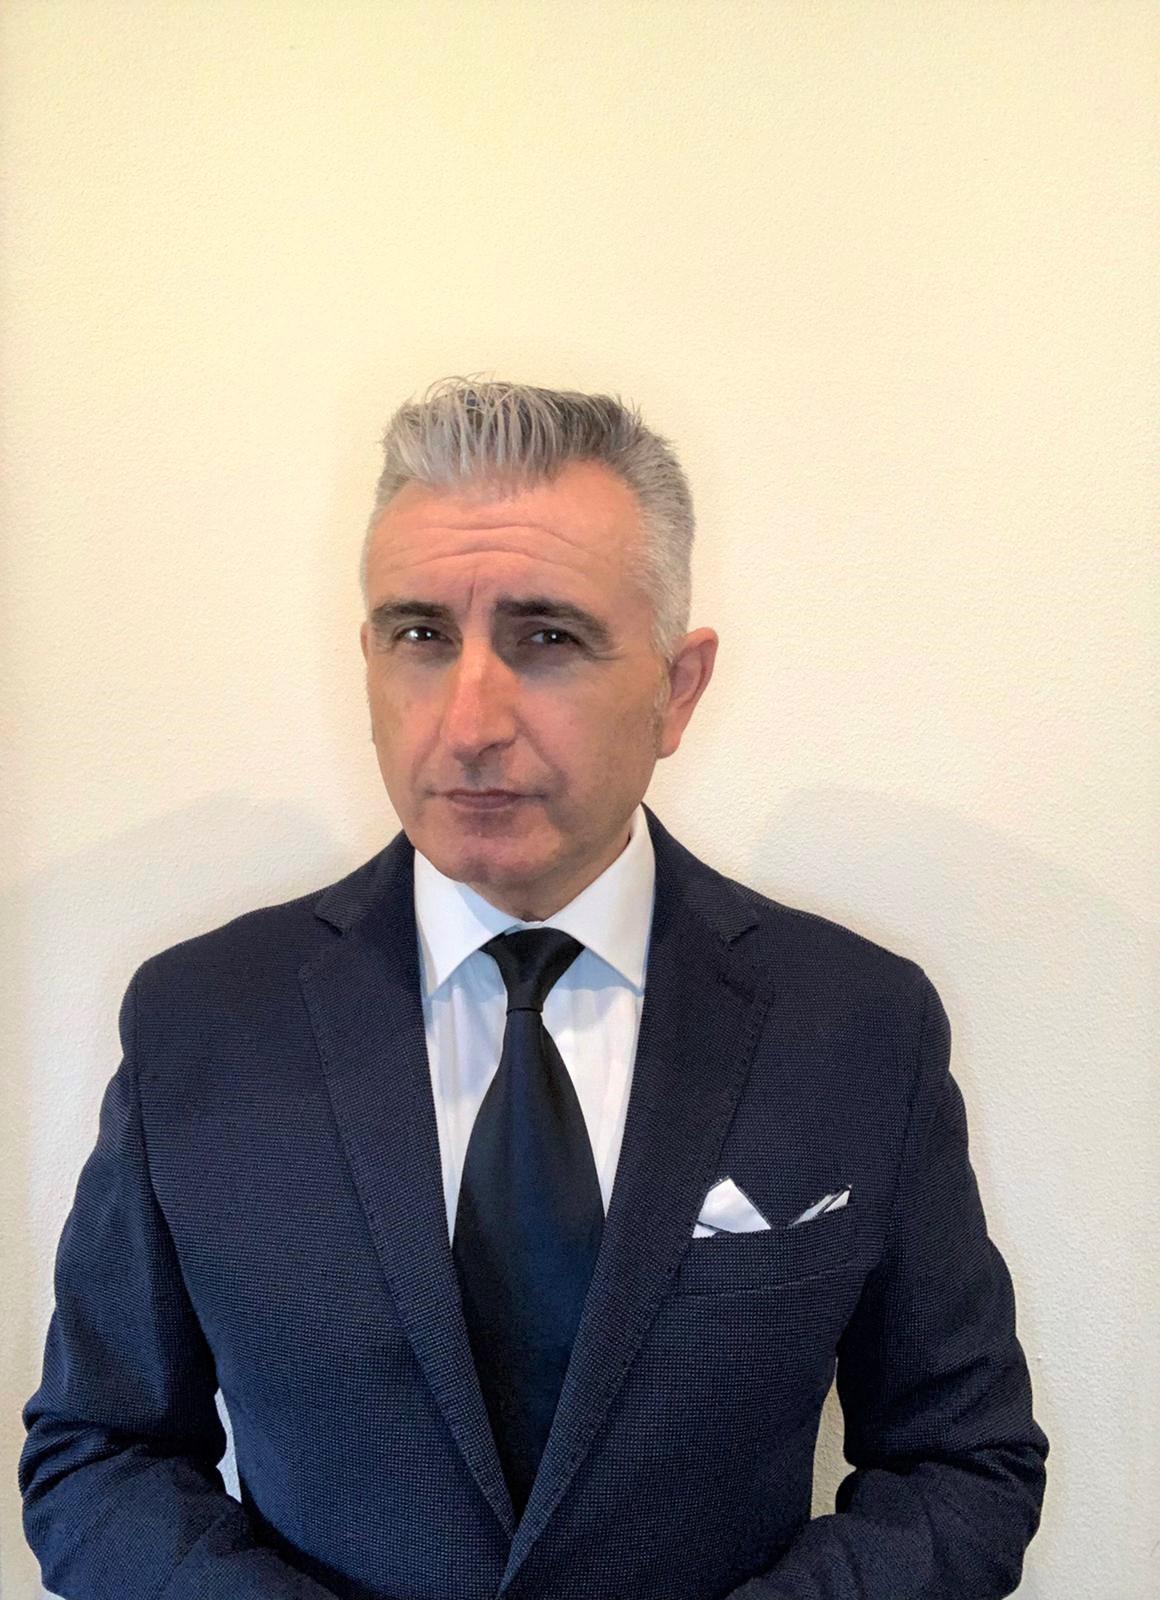 Massimo Toldo